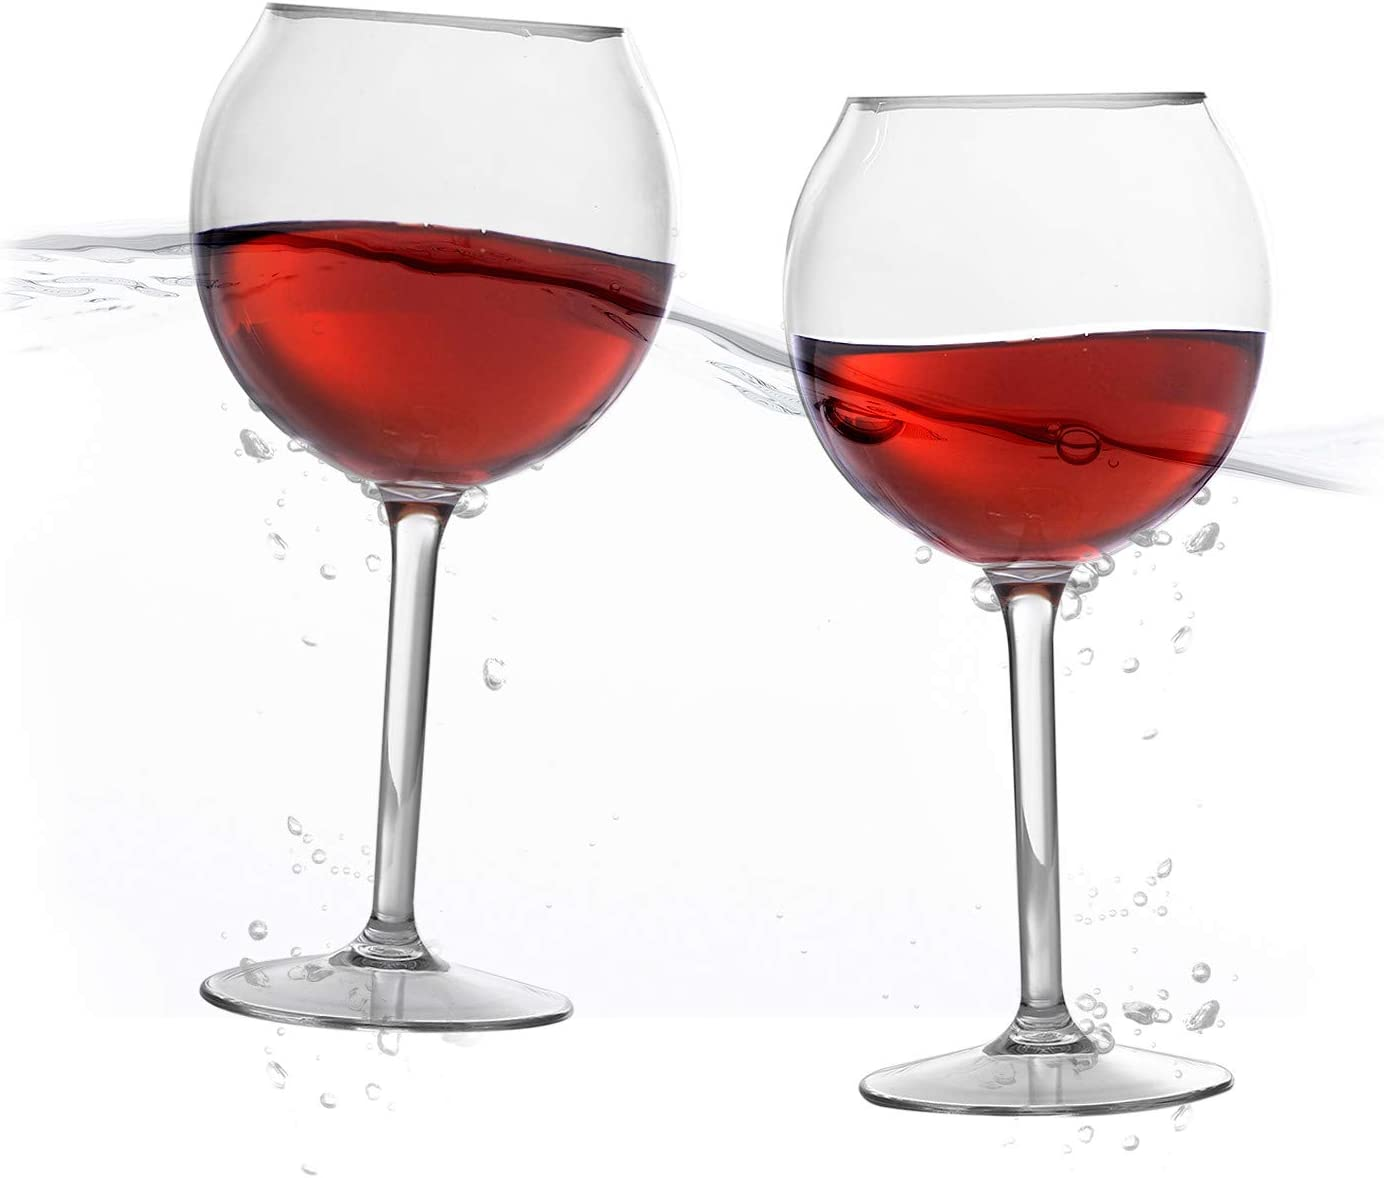 Floating Wine Glasses for Pool (18 Oz | Set of 2) - Pool Wine Glasses That Float | Shatterproof Poolside Wine Glasses | Floating Cup | Beach Glass | Outdoor Tritan Plastic Wine Glasses with Stem